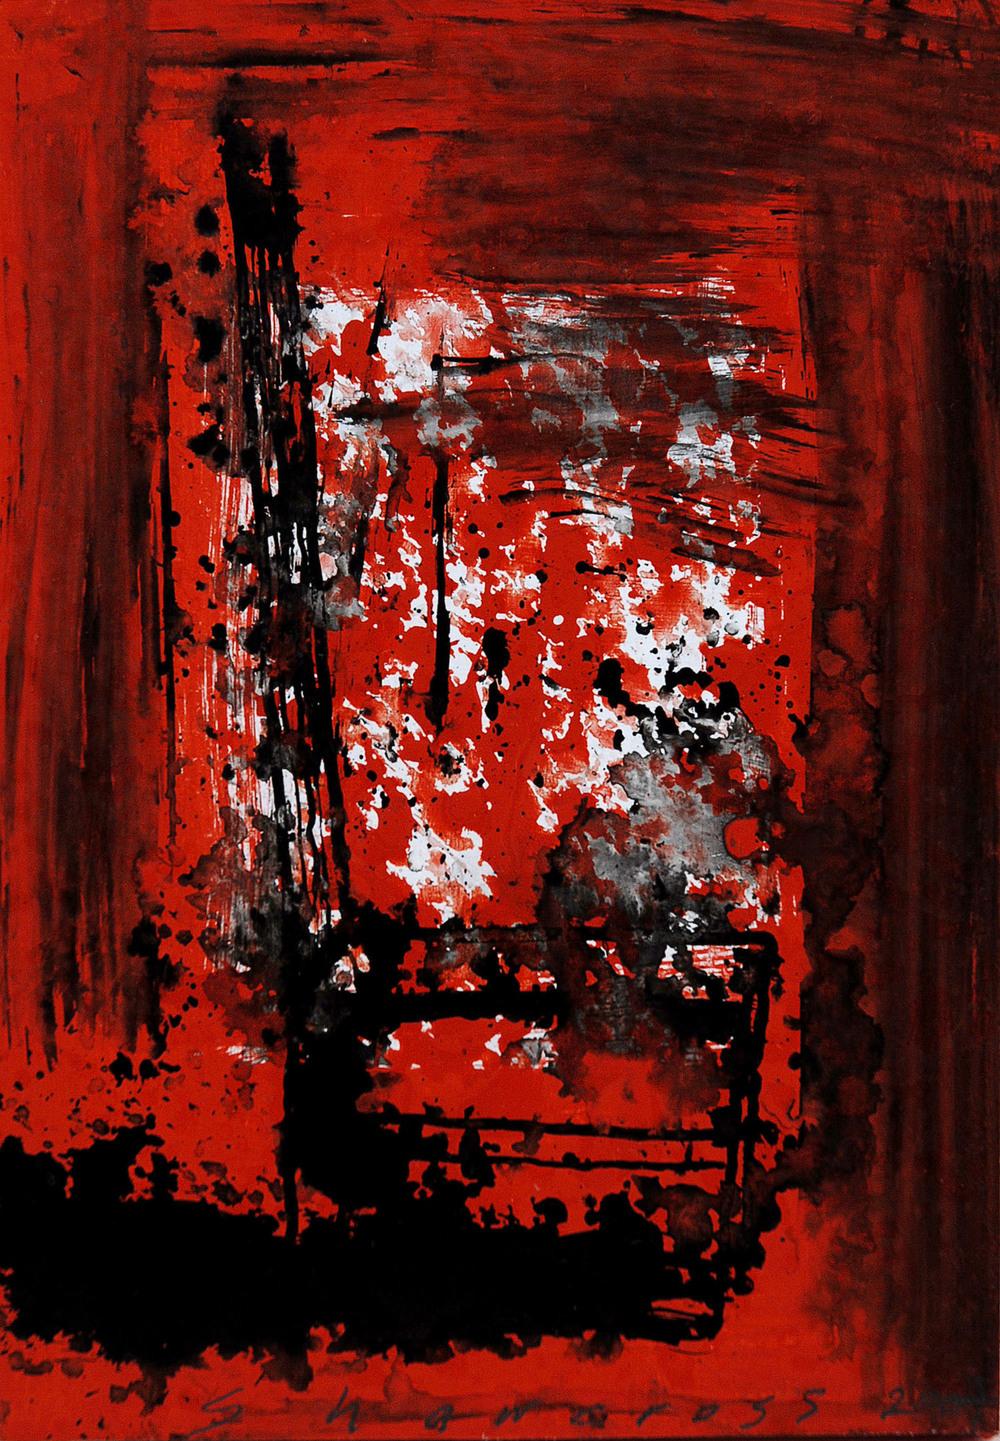 Neil Shawcross_-_#11_acrylic on board_20 x 13.5cm.jpg